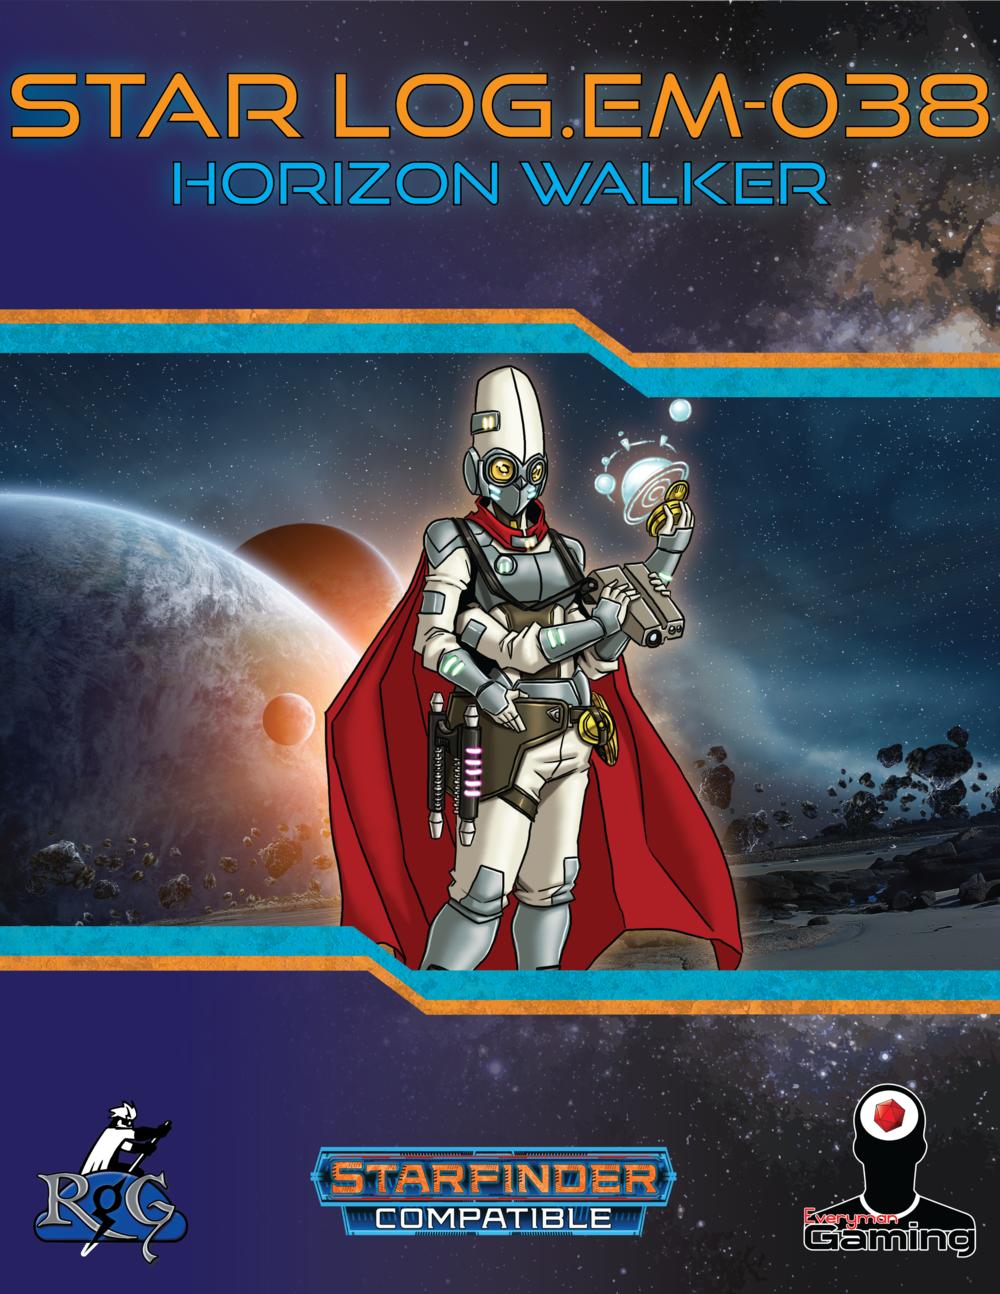 SF038 Horizon Walker.png